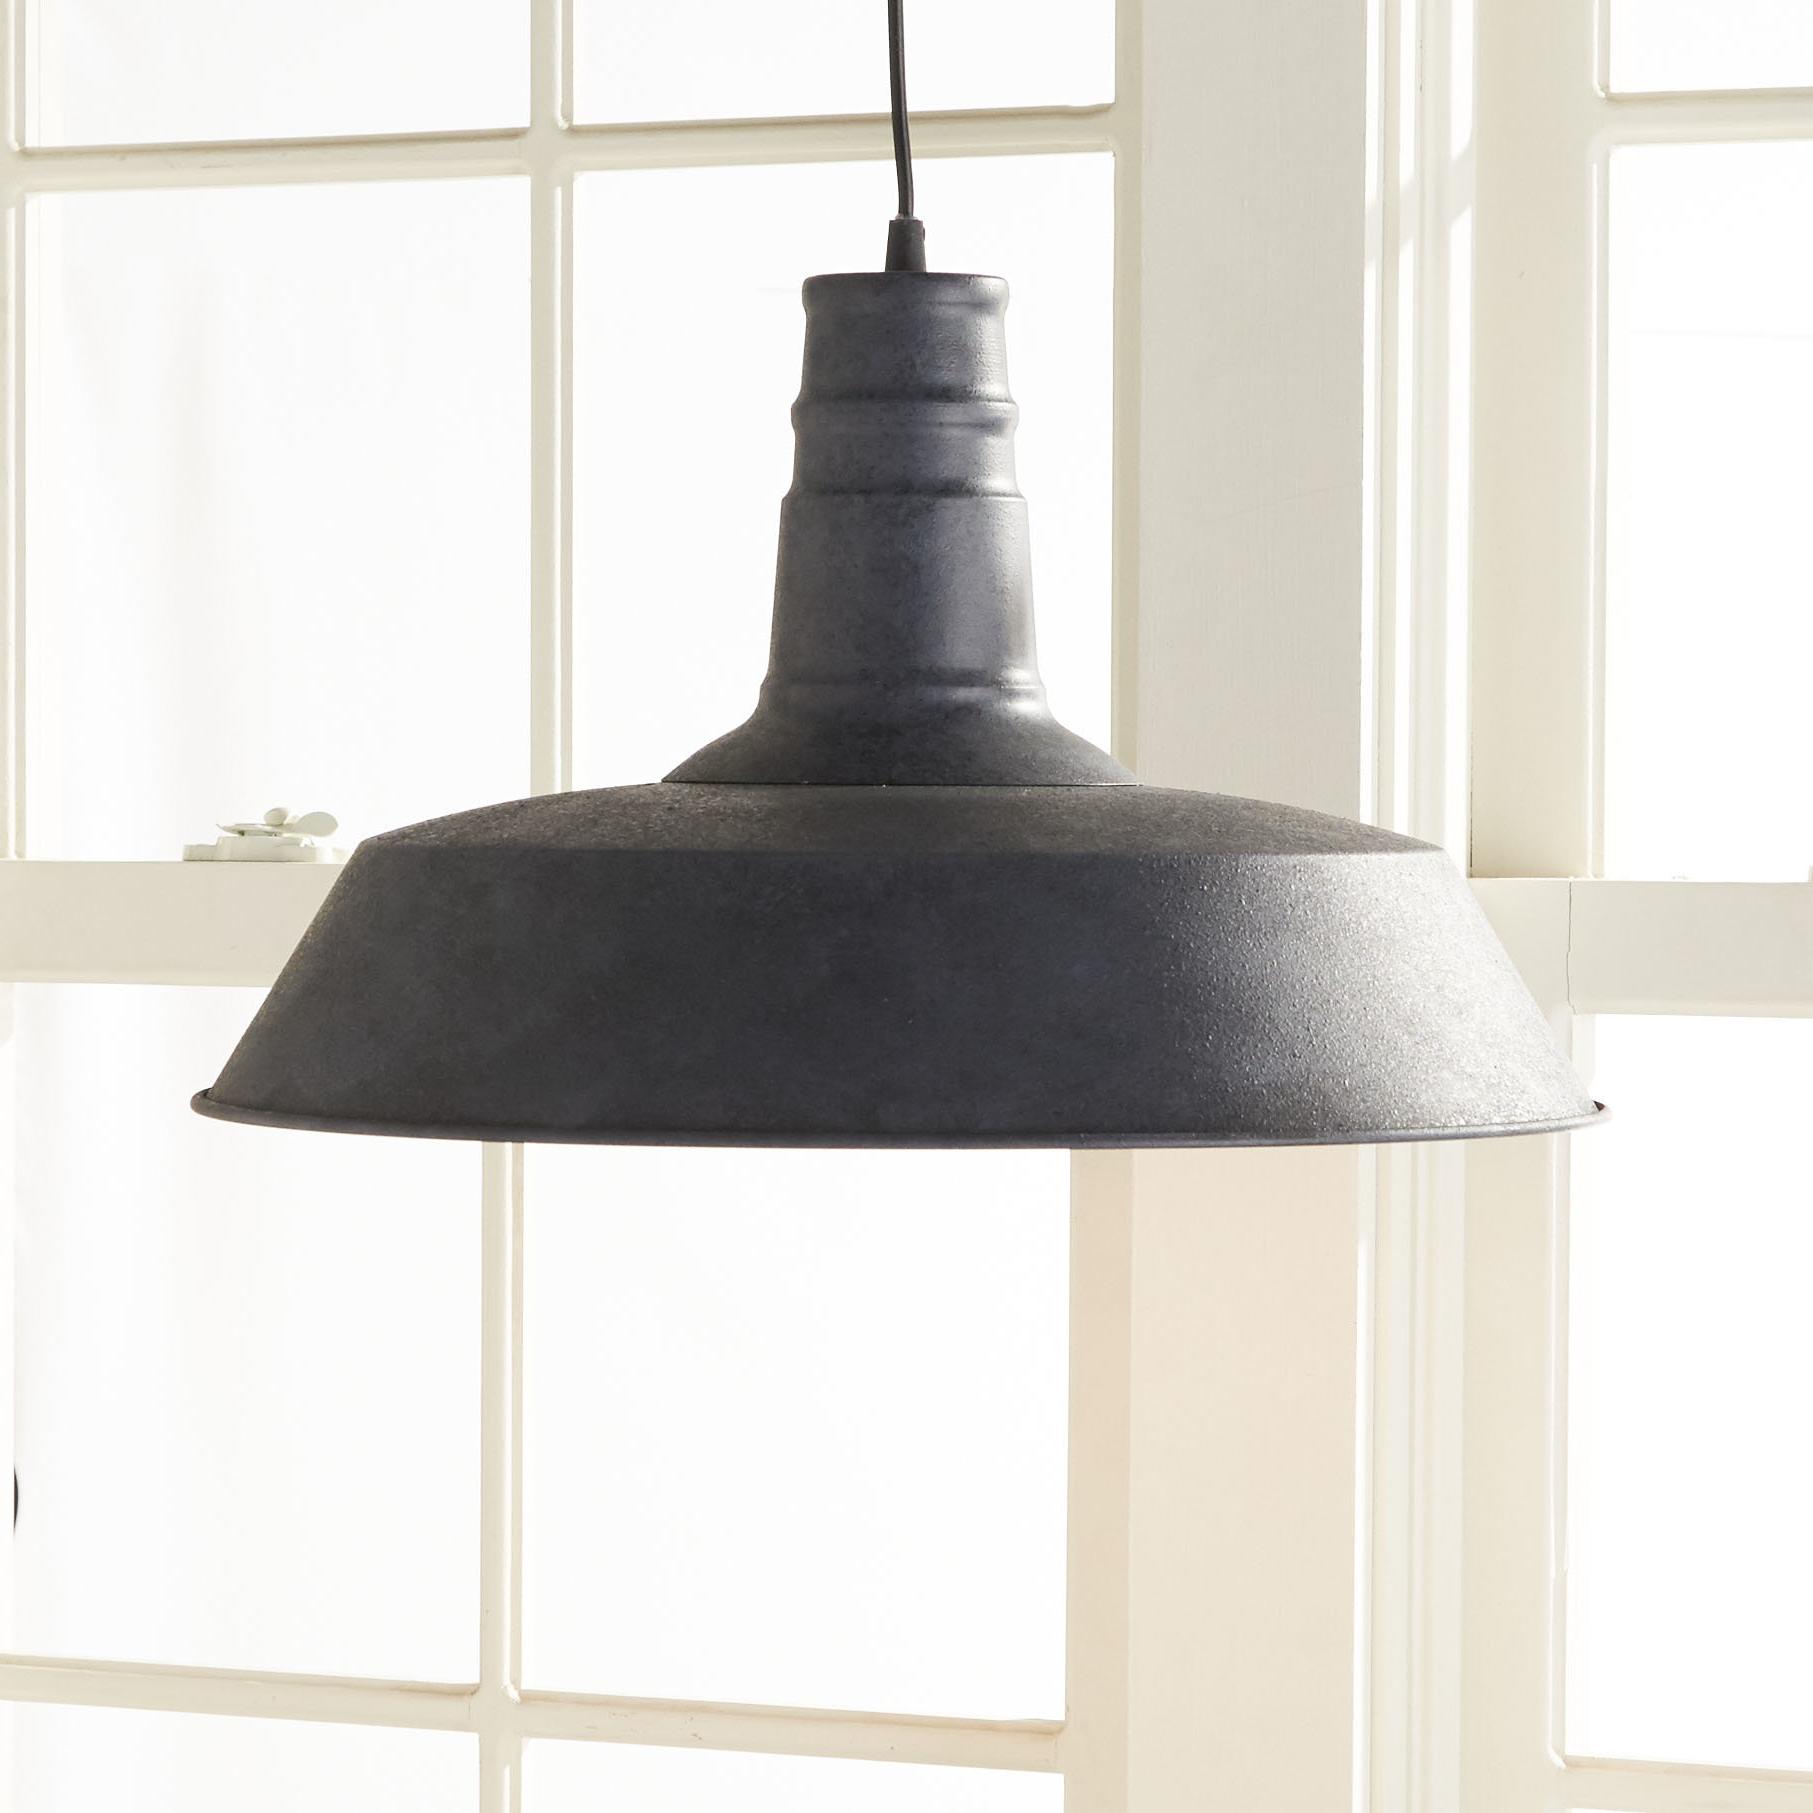 Newest Gattis 1 Light Dome Pendants In Ilgaz 1 Light Single Dome Pendant (View 17 of 20)